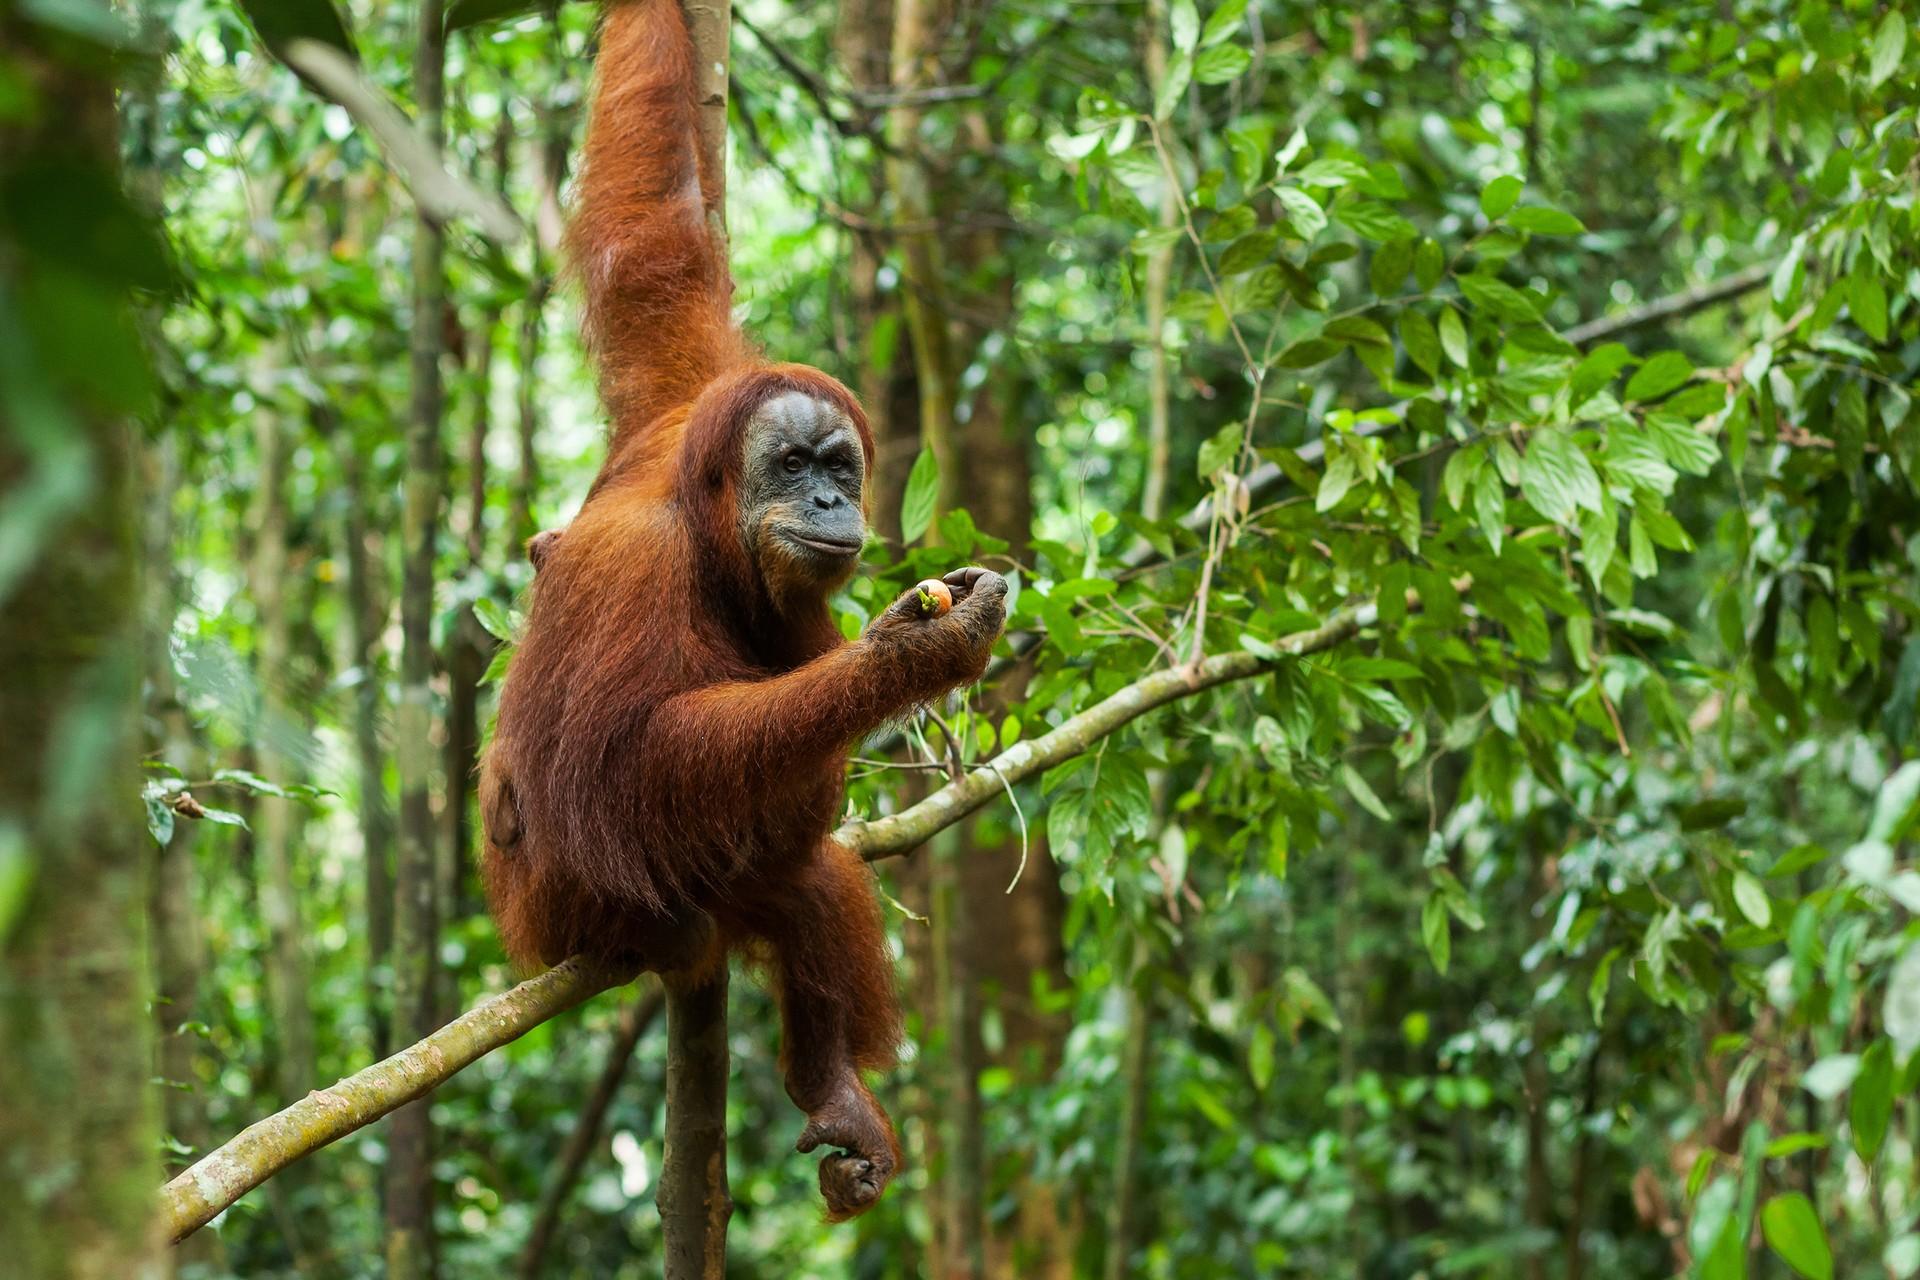 An orangutan sits on a branch in the Gunung Leuser National Park